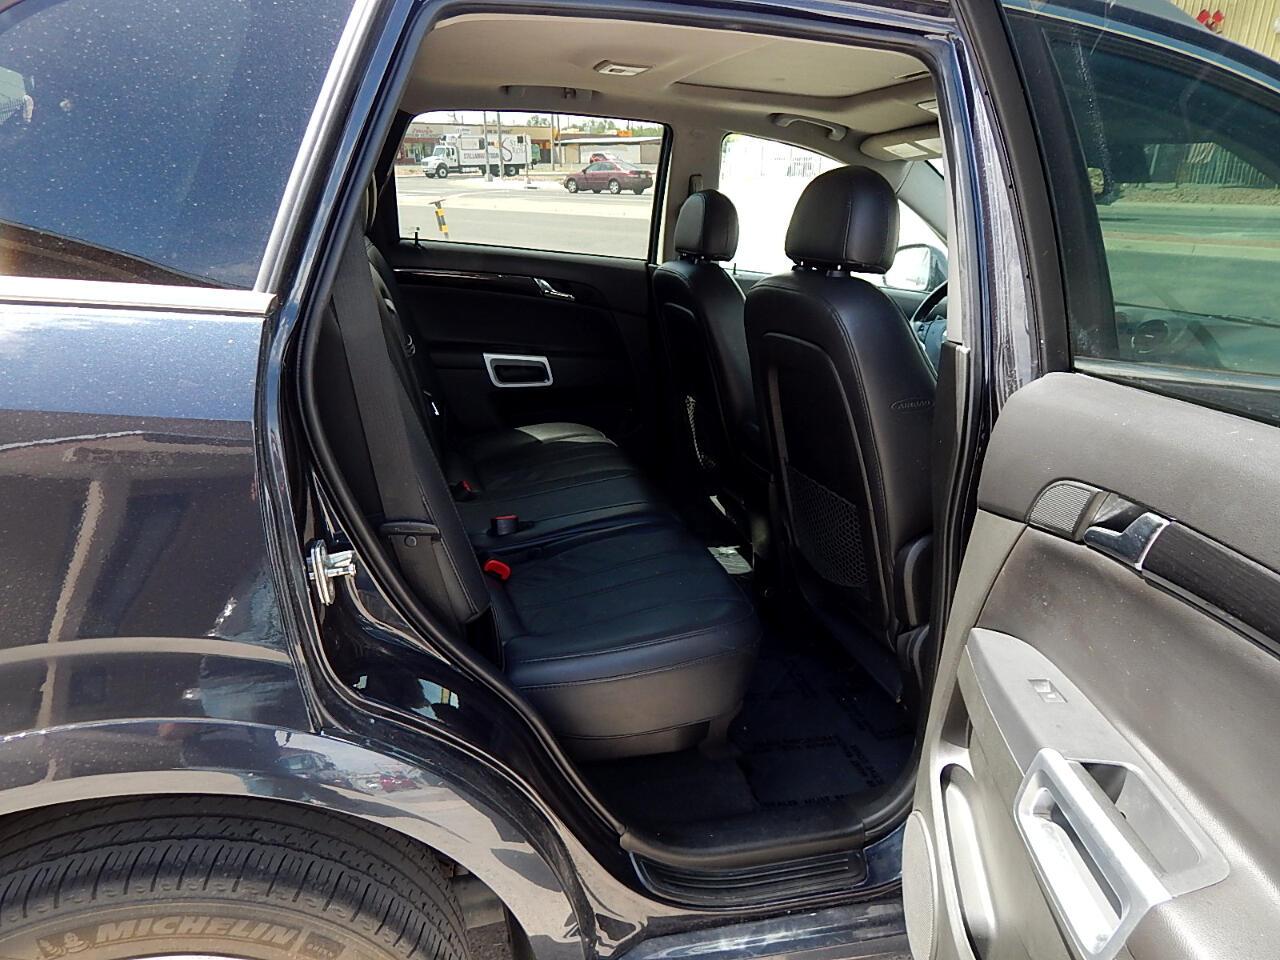 2015 Chevrolet Captiva Sport LTZ FWD